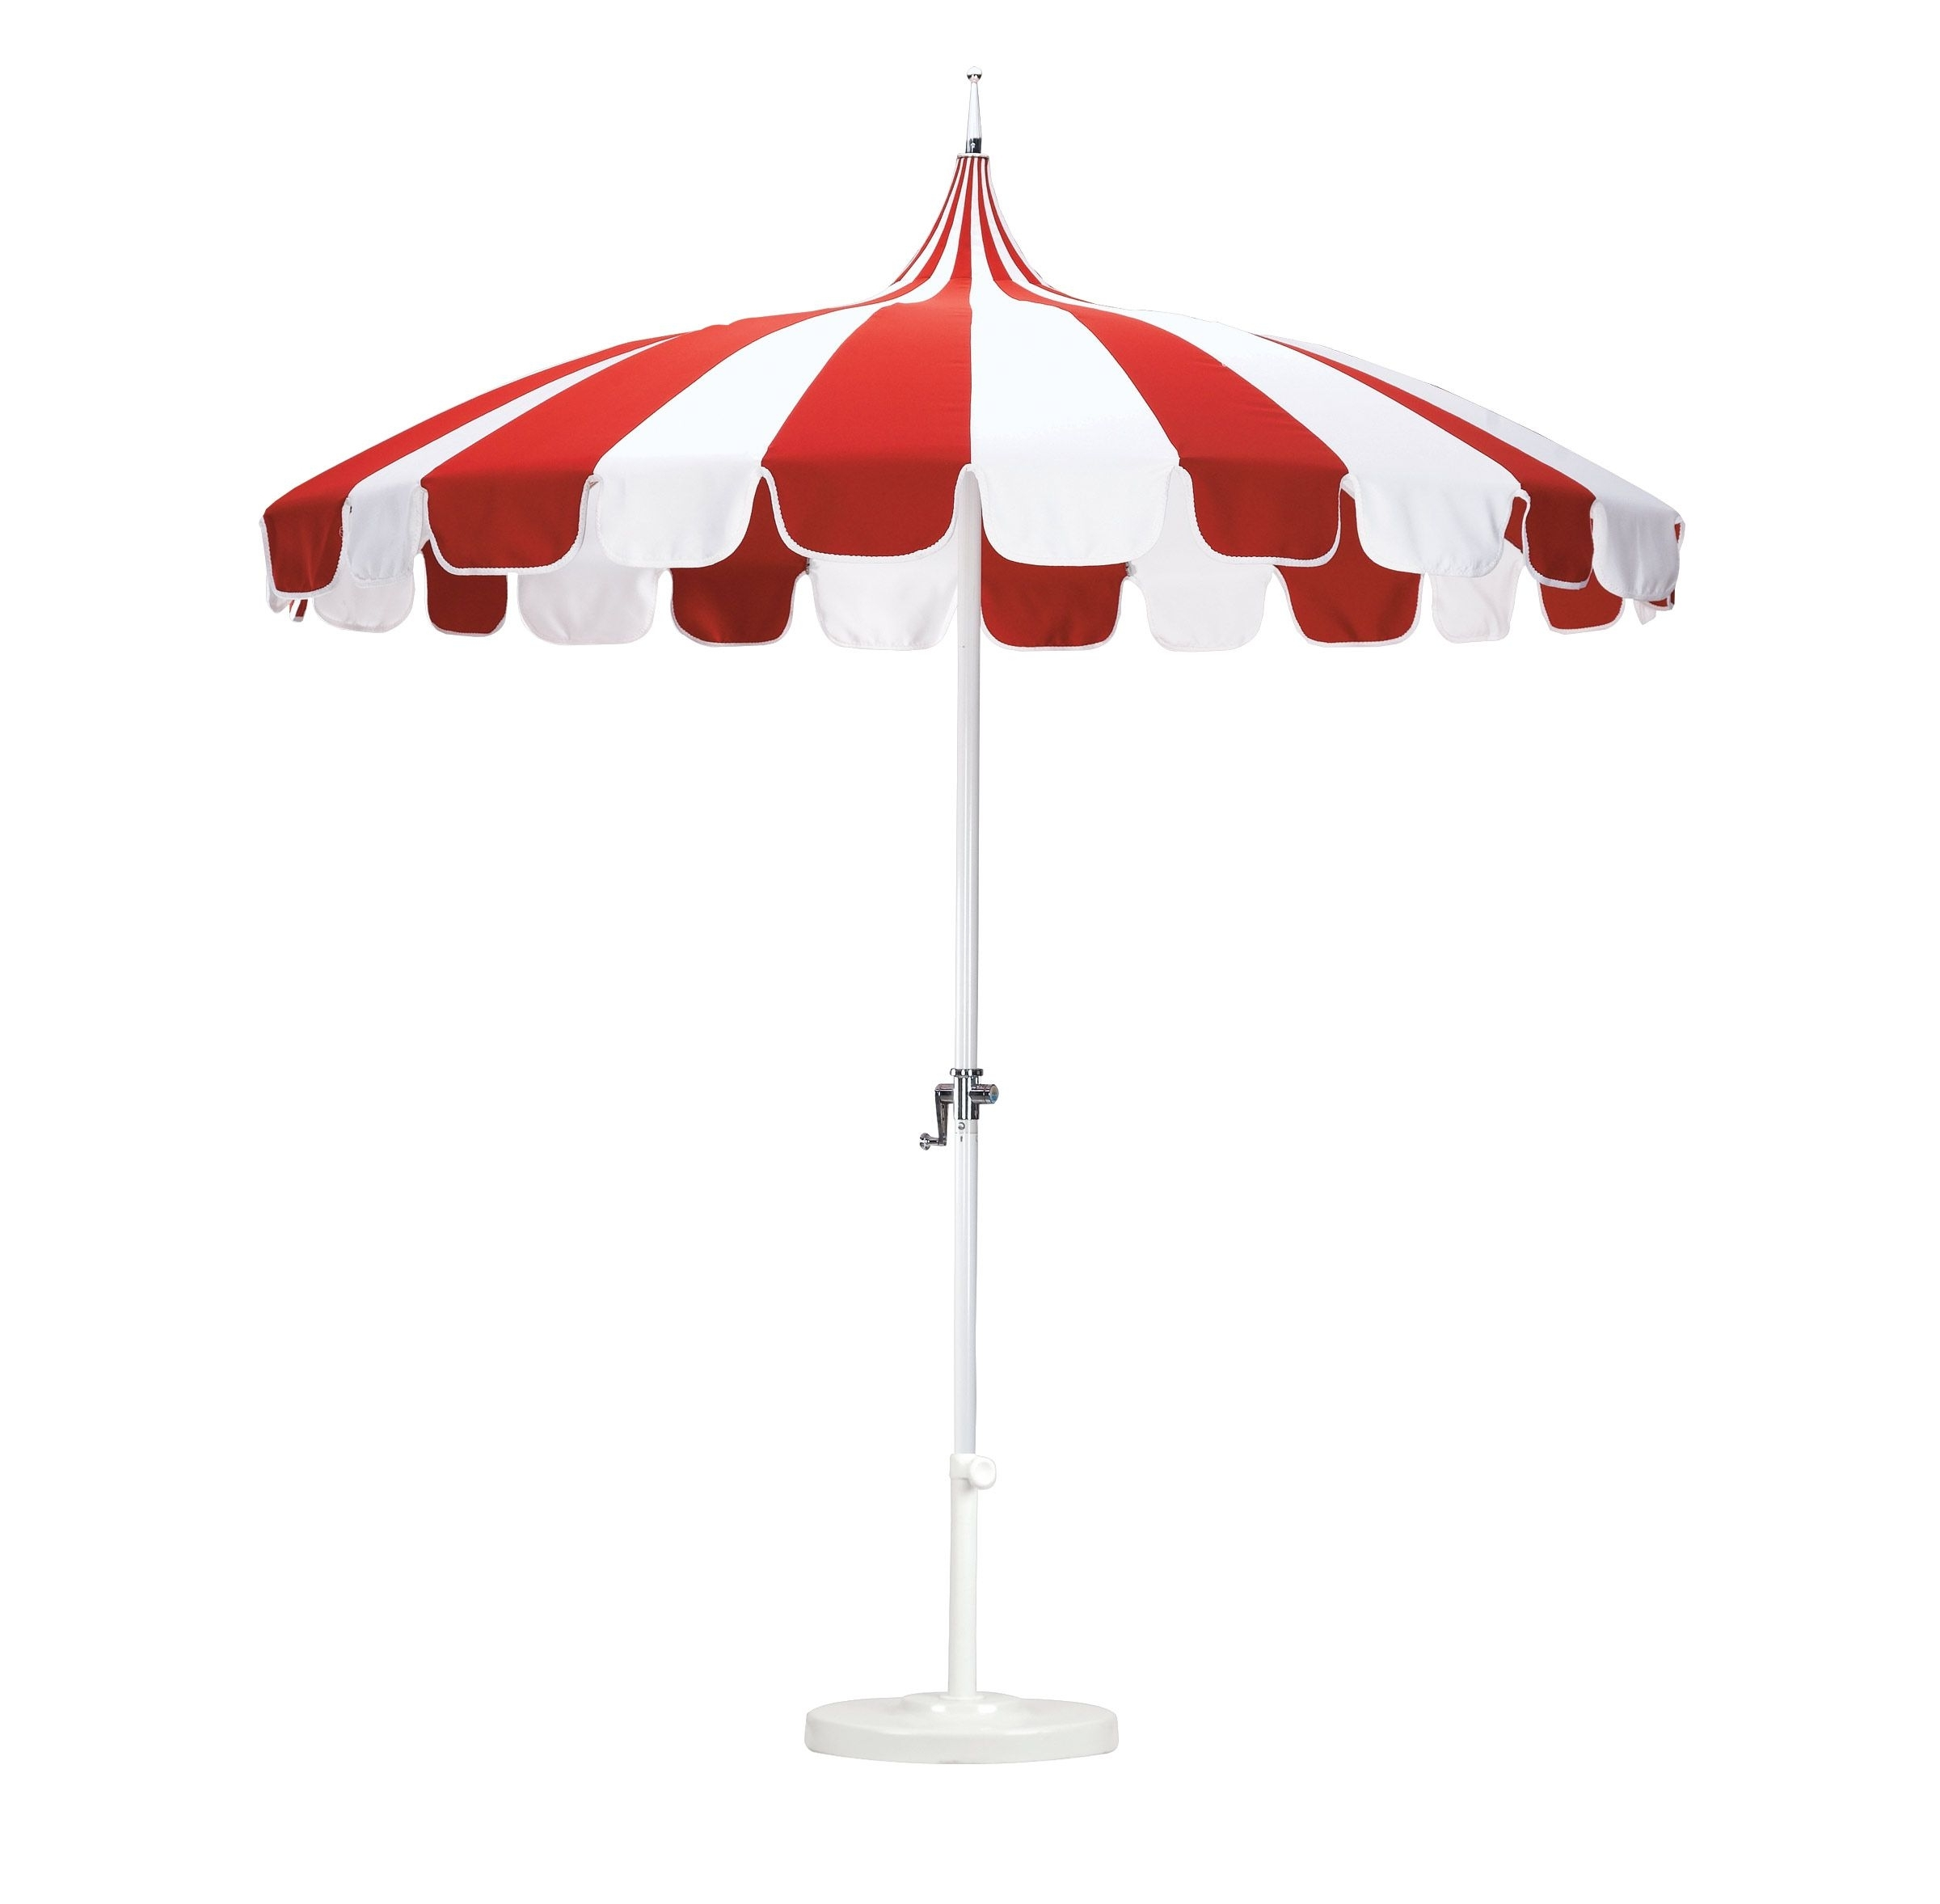 Sunbrella Patio Umbrella Look More At Http://besthomezone Inside Best And Newest Sunbrella Patio Umbrellas (View 9 of 20)